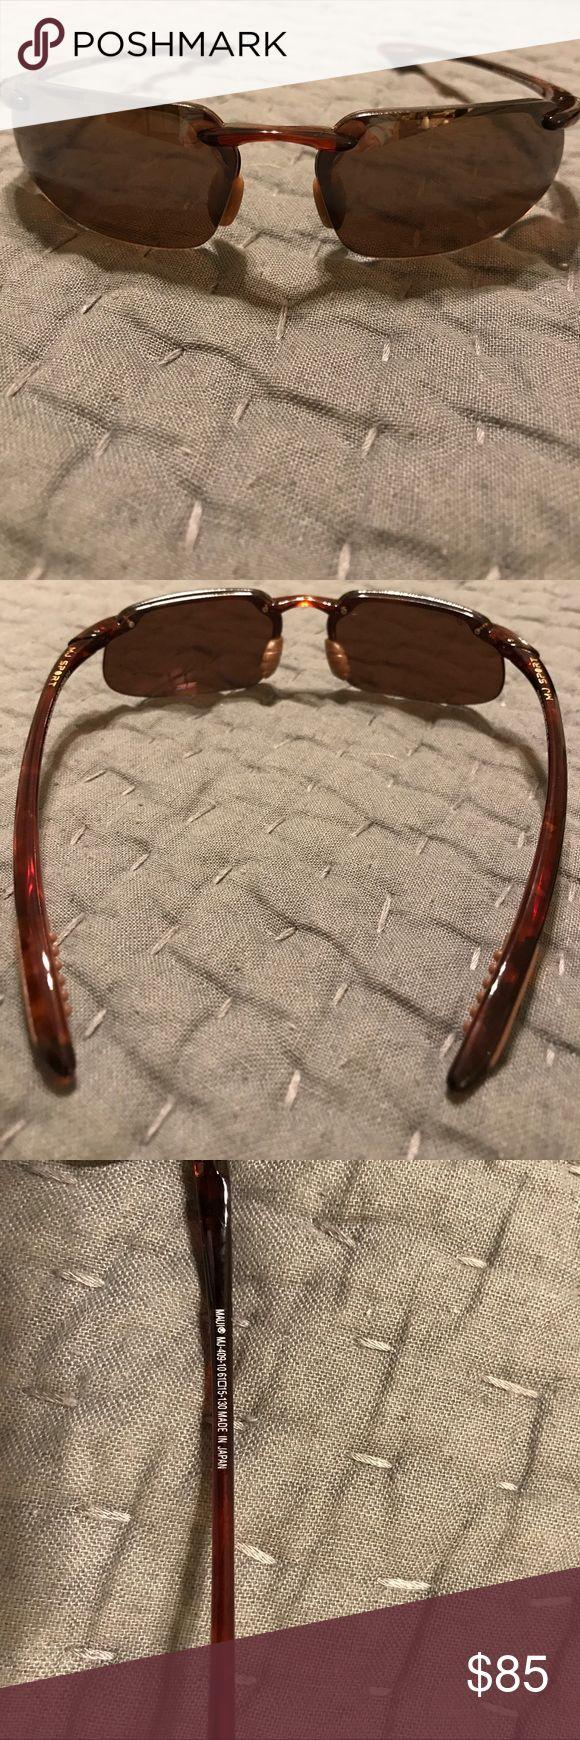 Maui Jim Sport Kahana Sunglasses Price reduced! Maui Jim Sport sunglasses in great condition. Tortoise frame, HCL bronze lenses. Original box, case and cleaning cloth included. Maui Jim Accessories Sunglasses